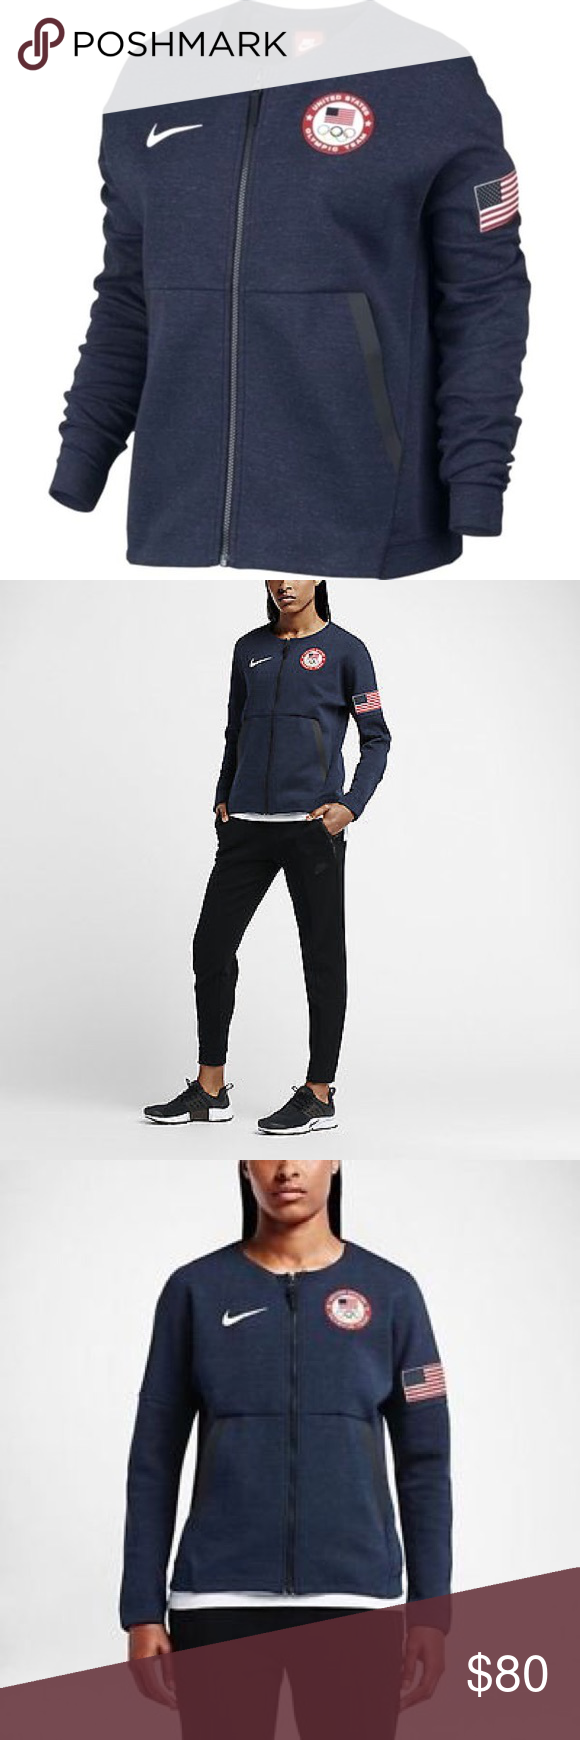 Nike Tech Fleece Blue Team USA Rio Olympics Jacket (With